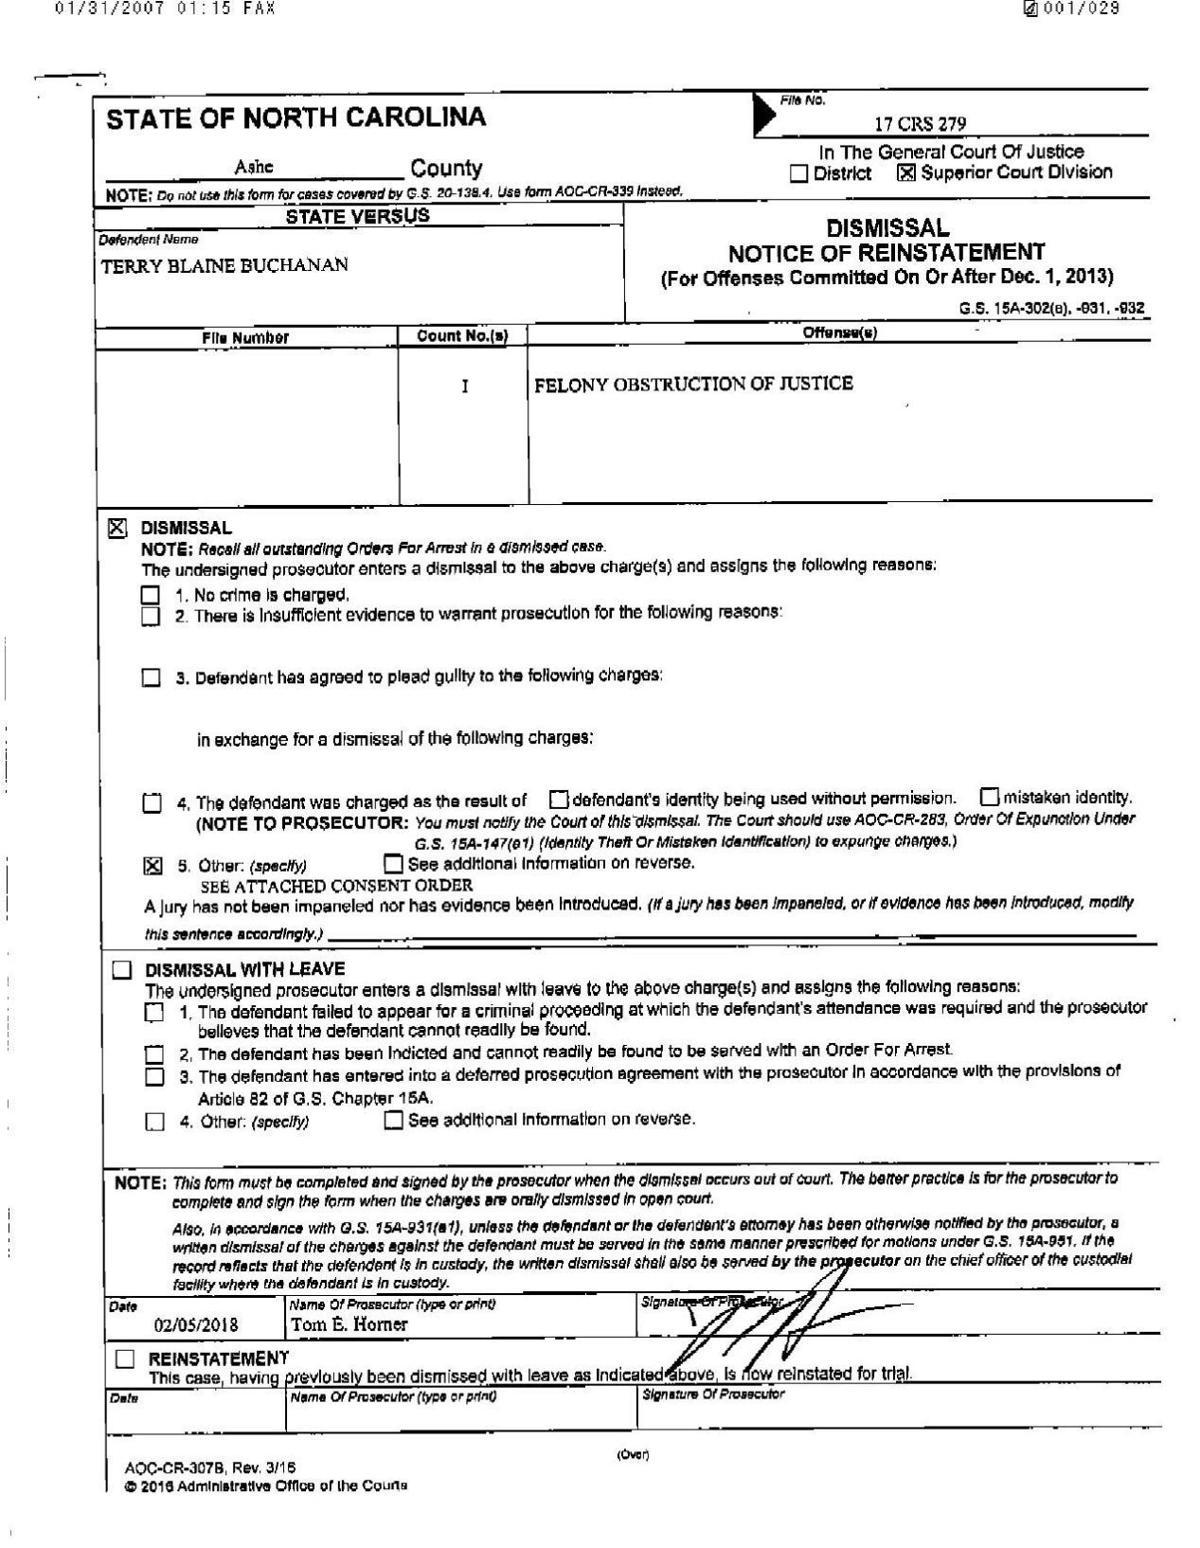 Court documents in Buchanan case